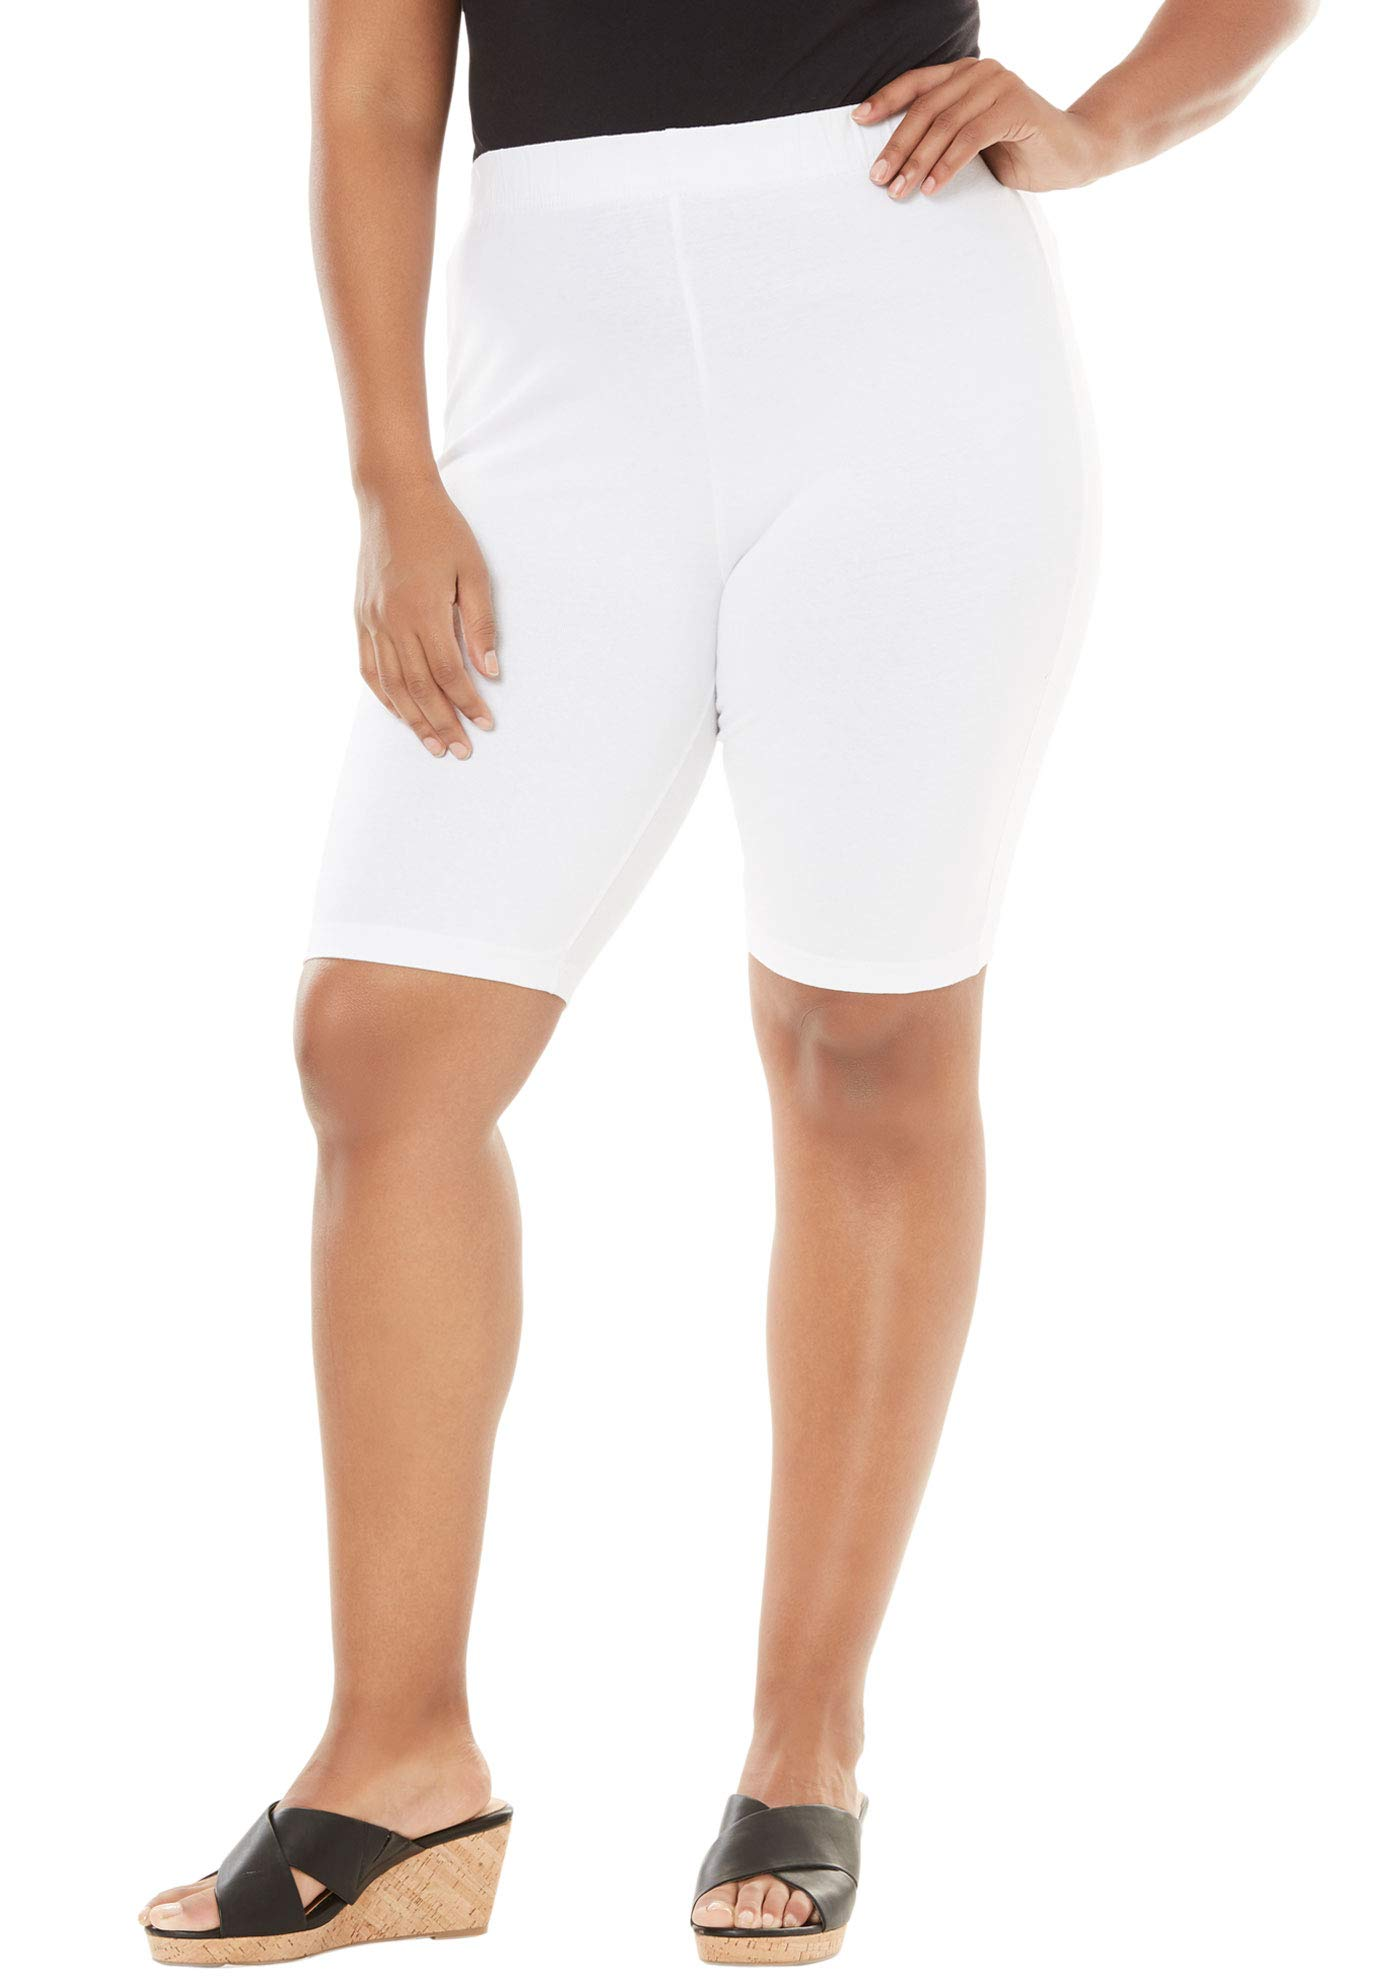 Roamans Women's Plus Size Essential Stretch Bike Short - White, 4X by Roamans